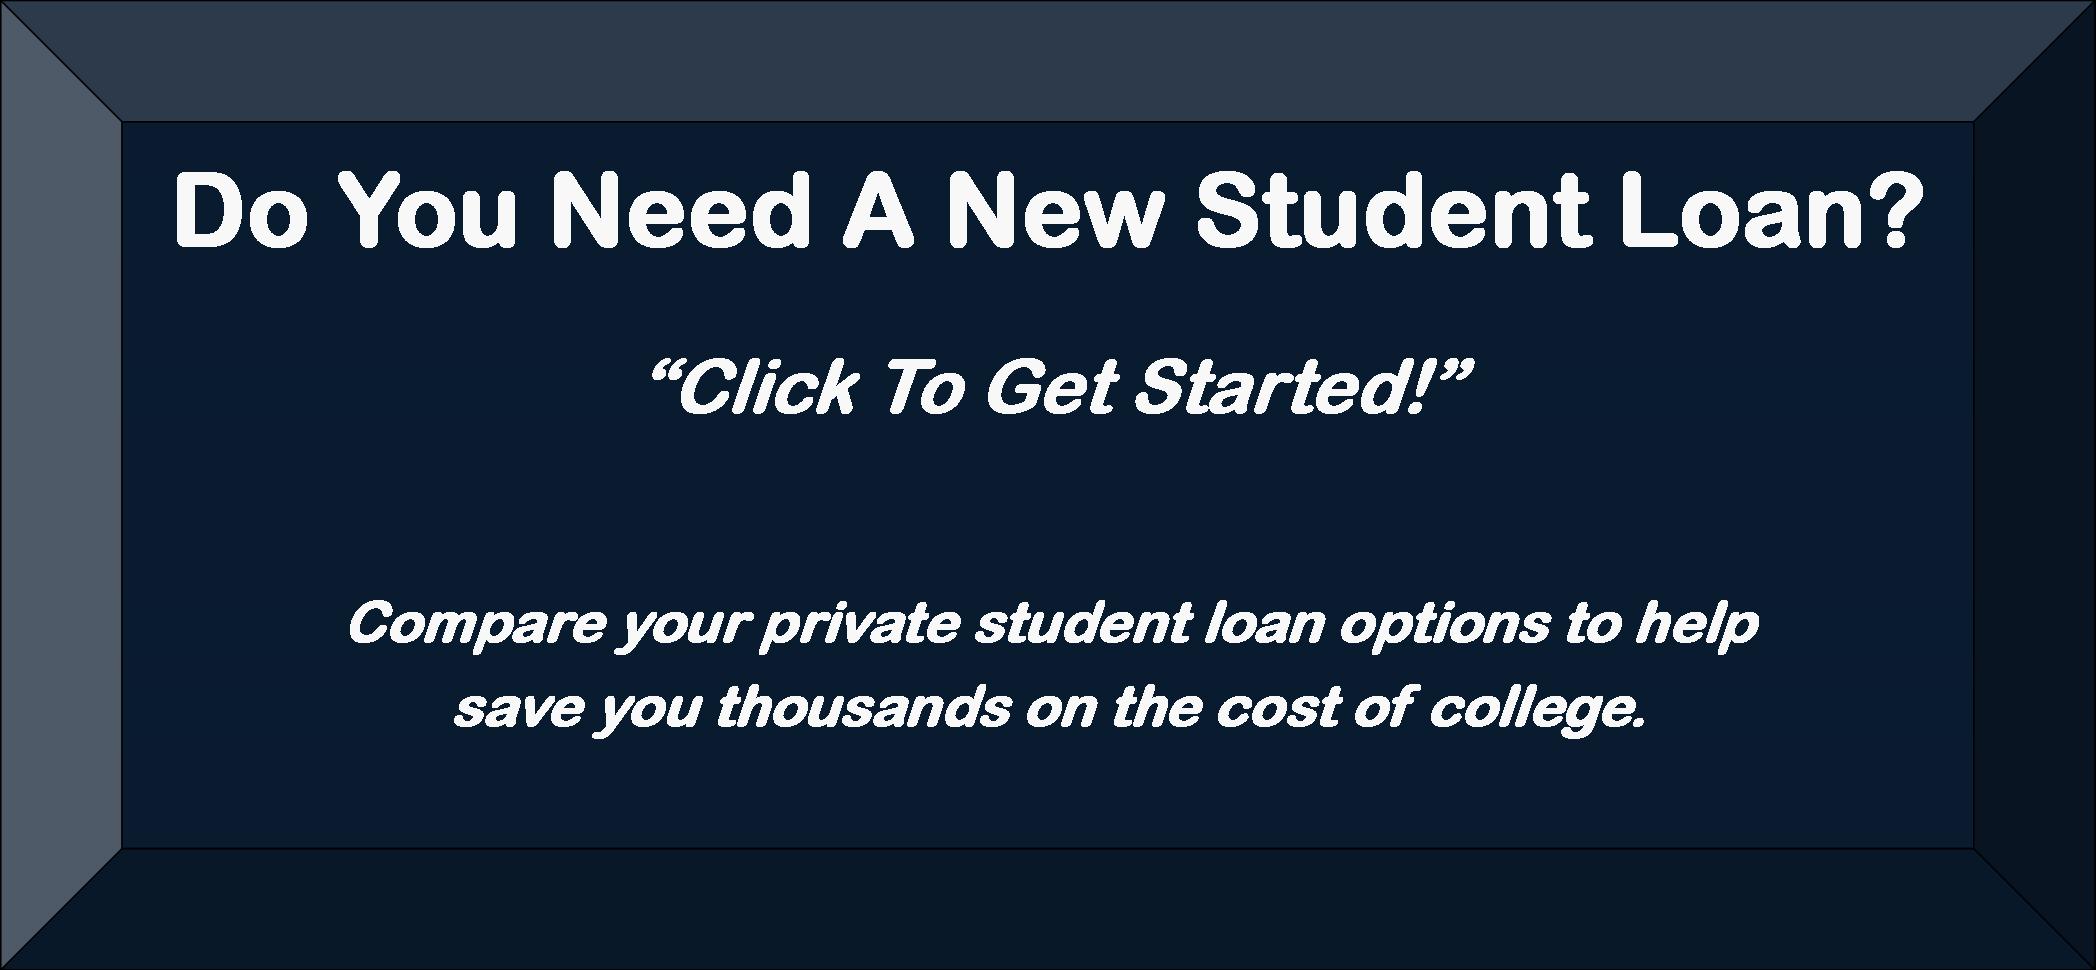 New Student Loan Options